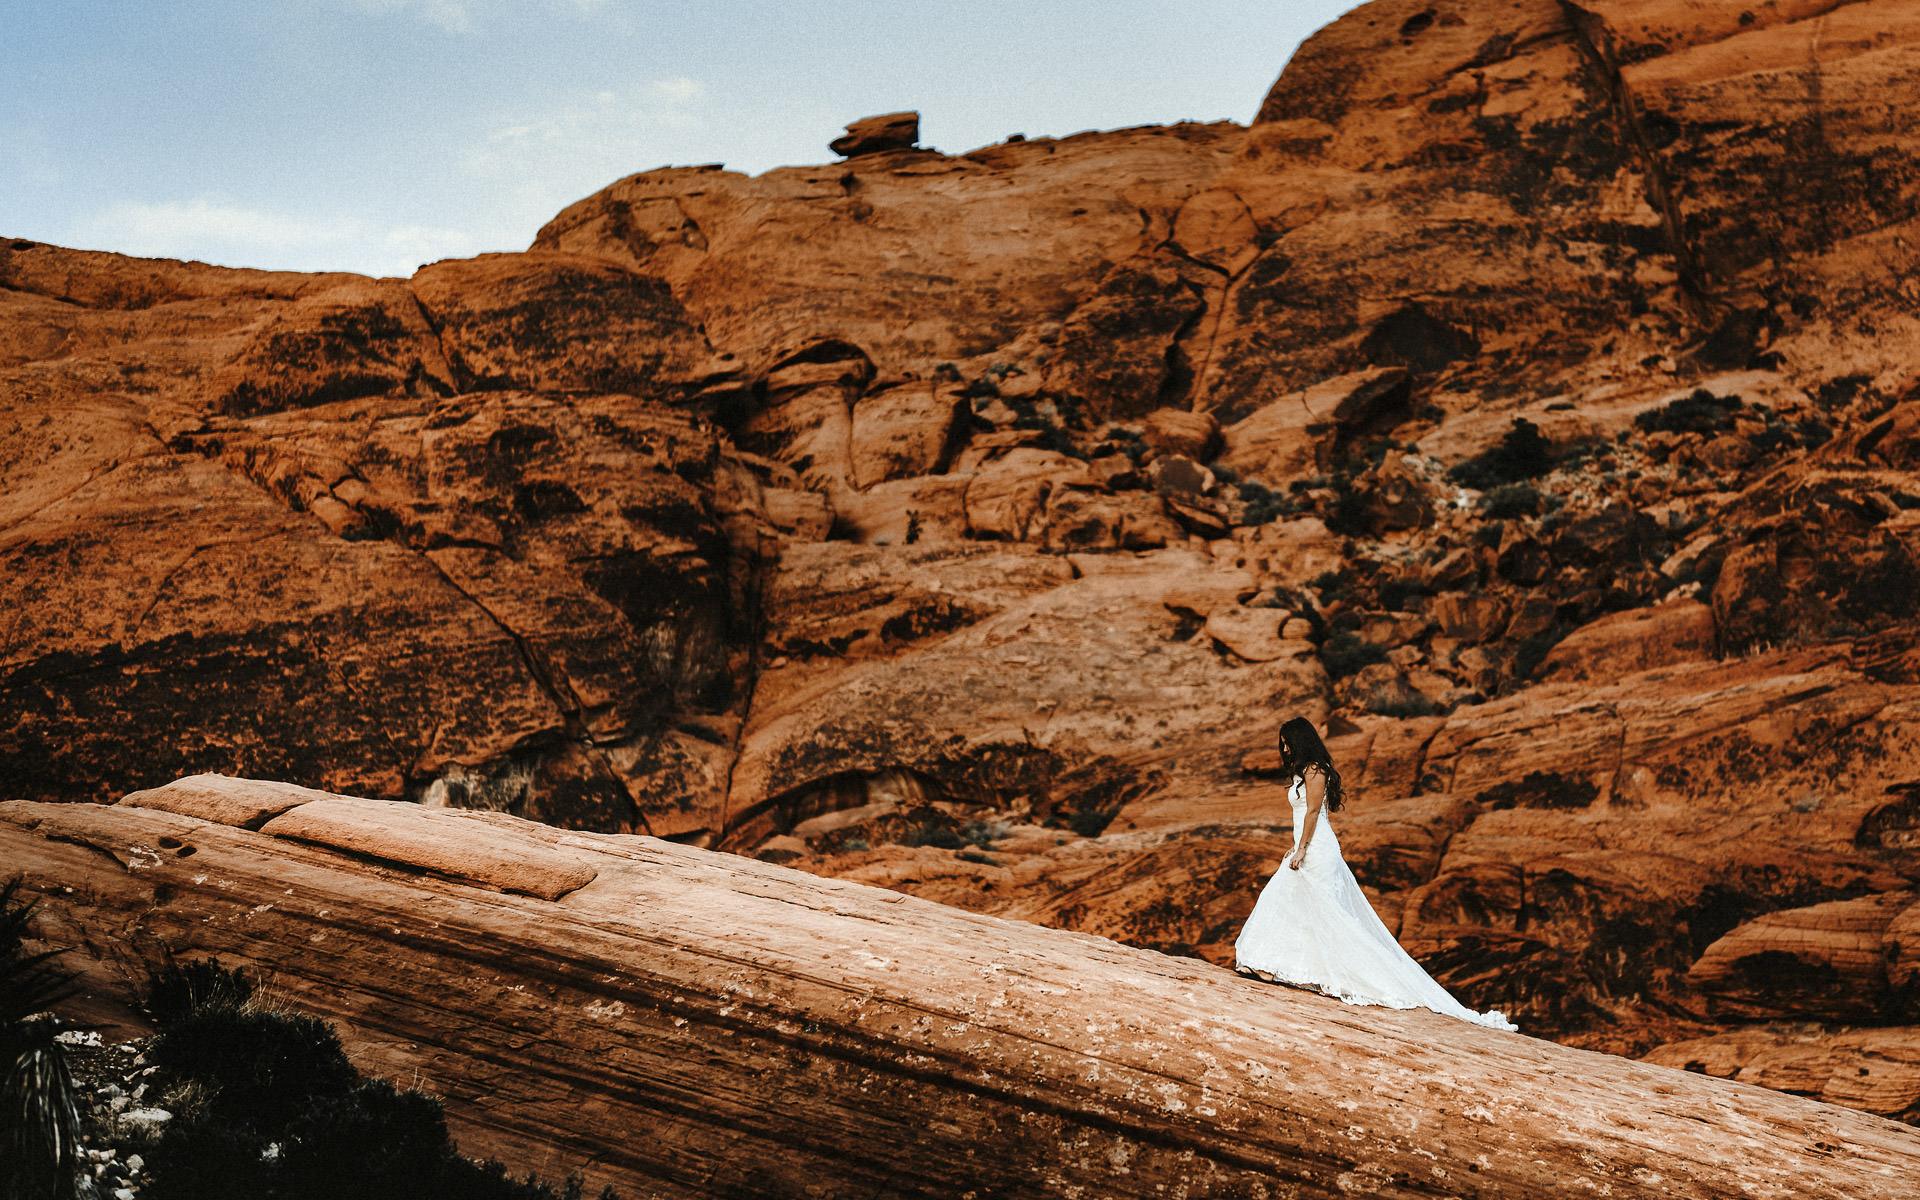 Twisted-Oaks-Studio-wppi-leica-red-rock-canyon-30.jpg